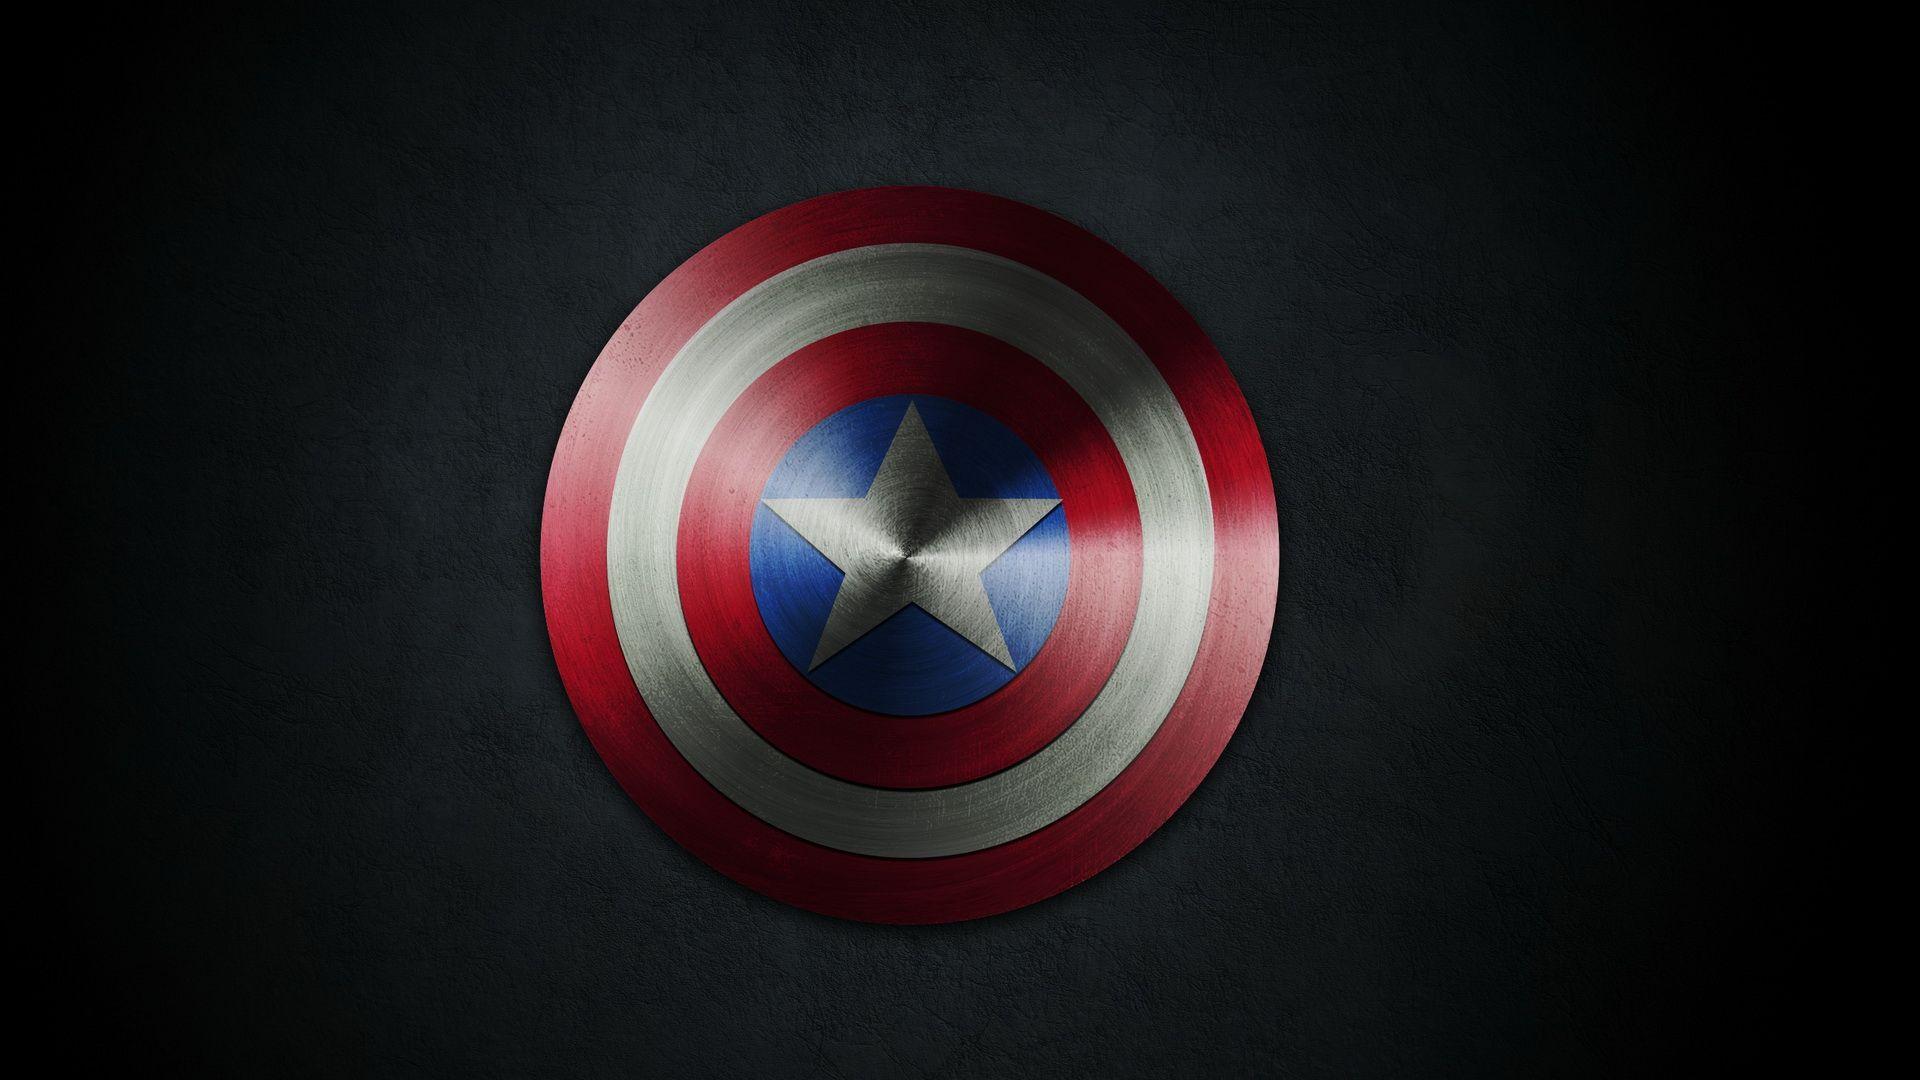 Captain America Hd Wallpapers Free Download Art Wallpaper